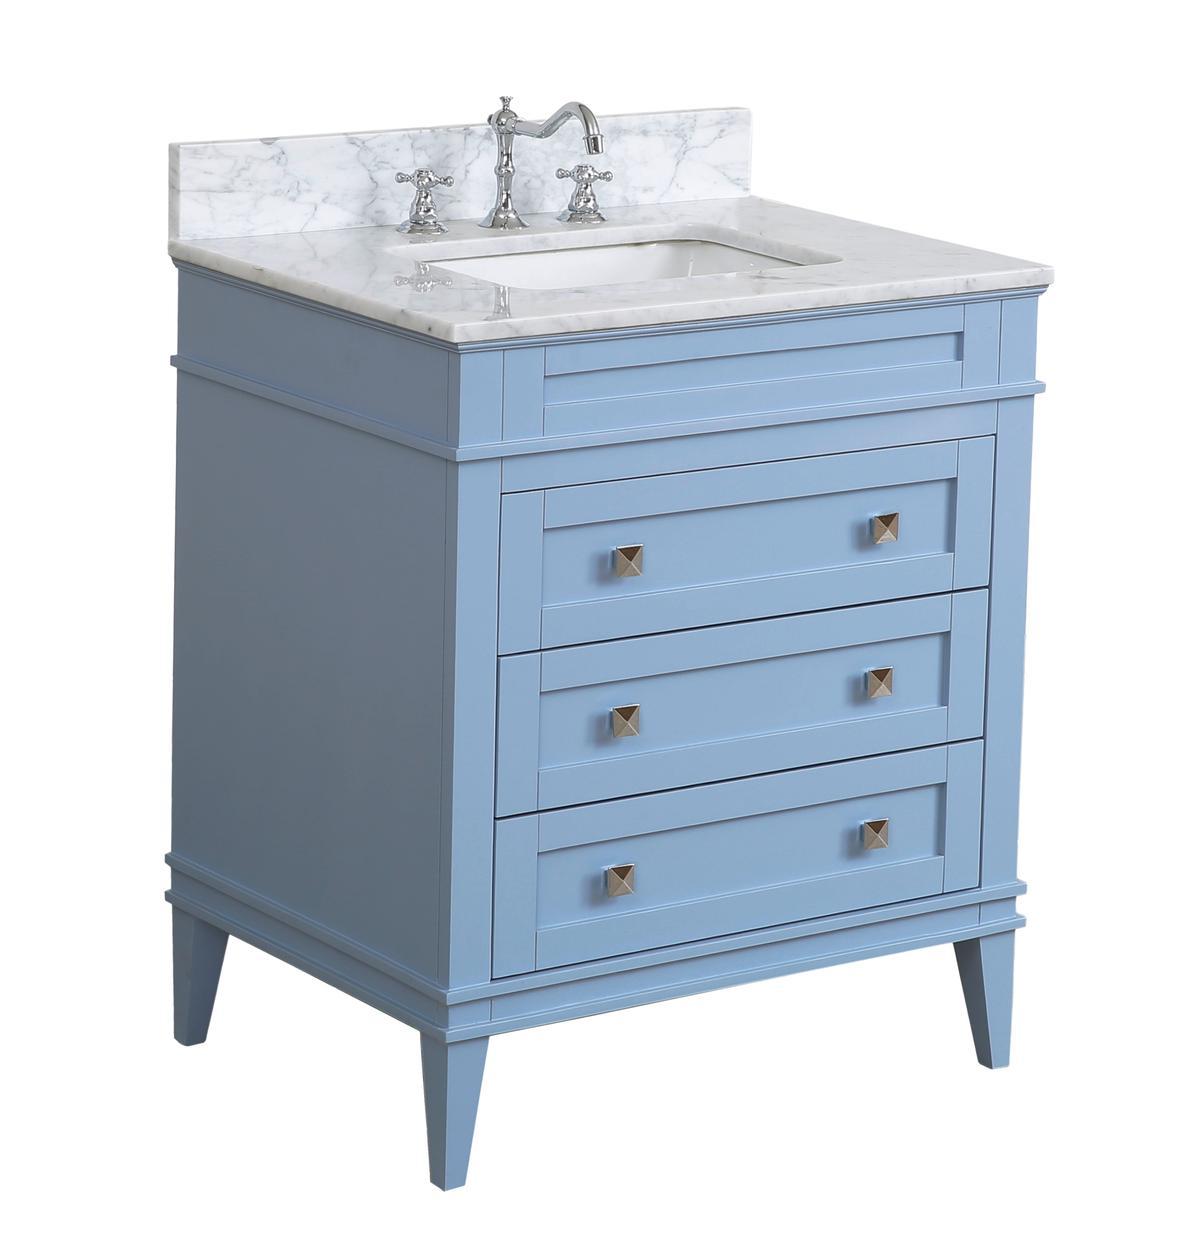 Ik009 European Classic Vanity Small Closeout Custom Wood Bathroom Vanity Color Blue Made In Vietnam Buy Wooden Bathroom Vanity Small Bathroom Vanity Made In Vietnam European Classic Vanity Product On Alibaba Com